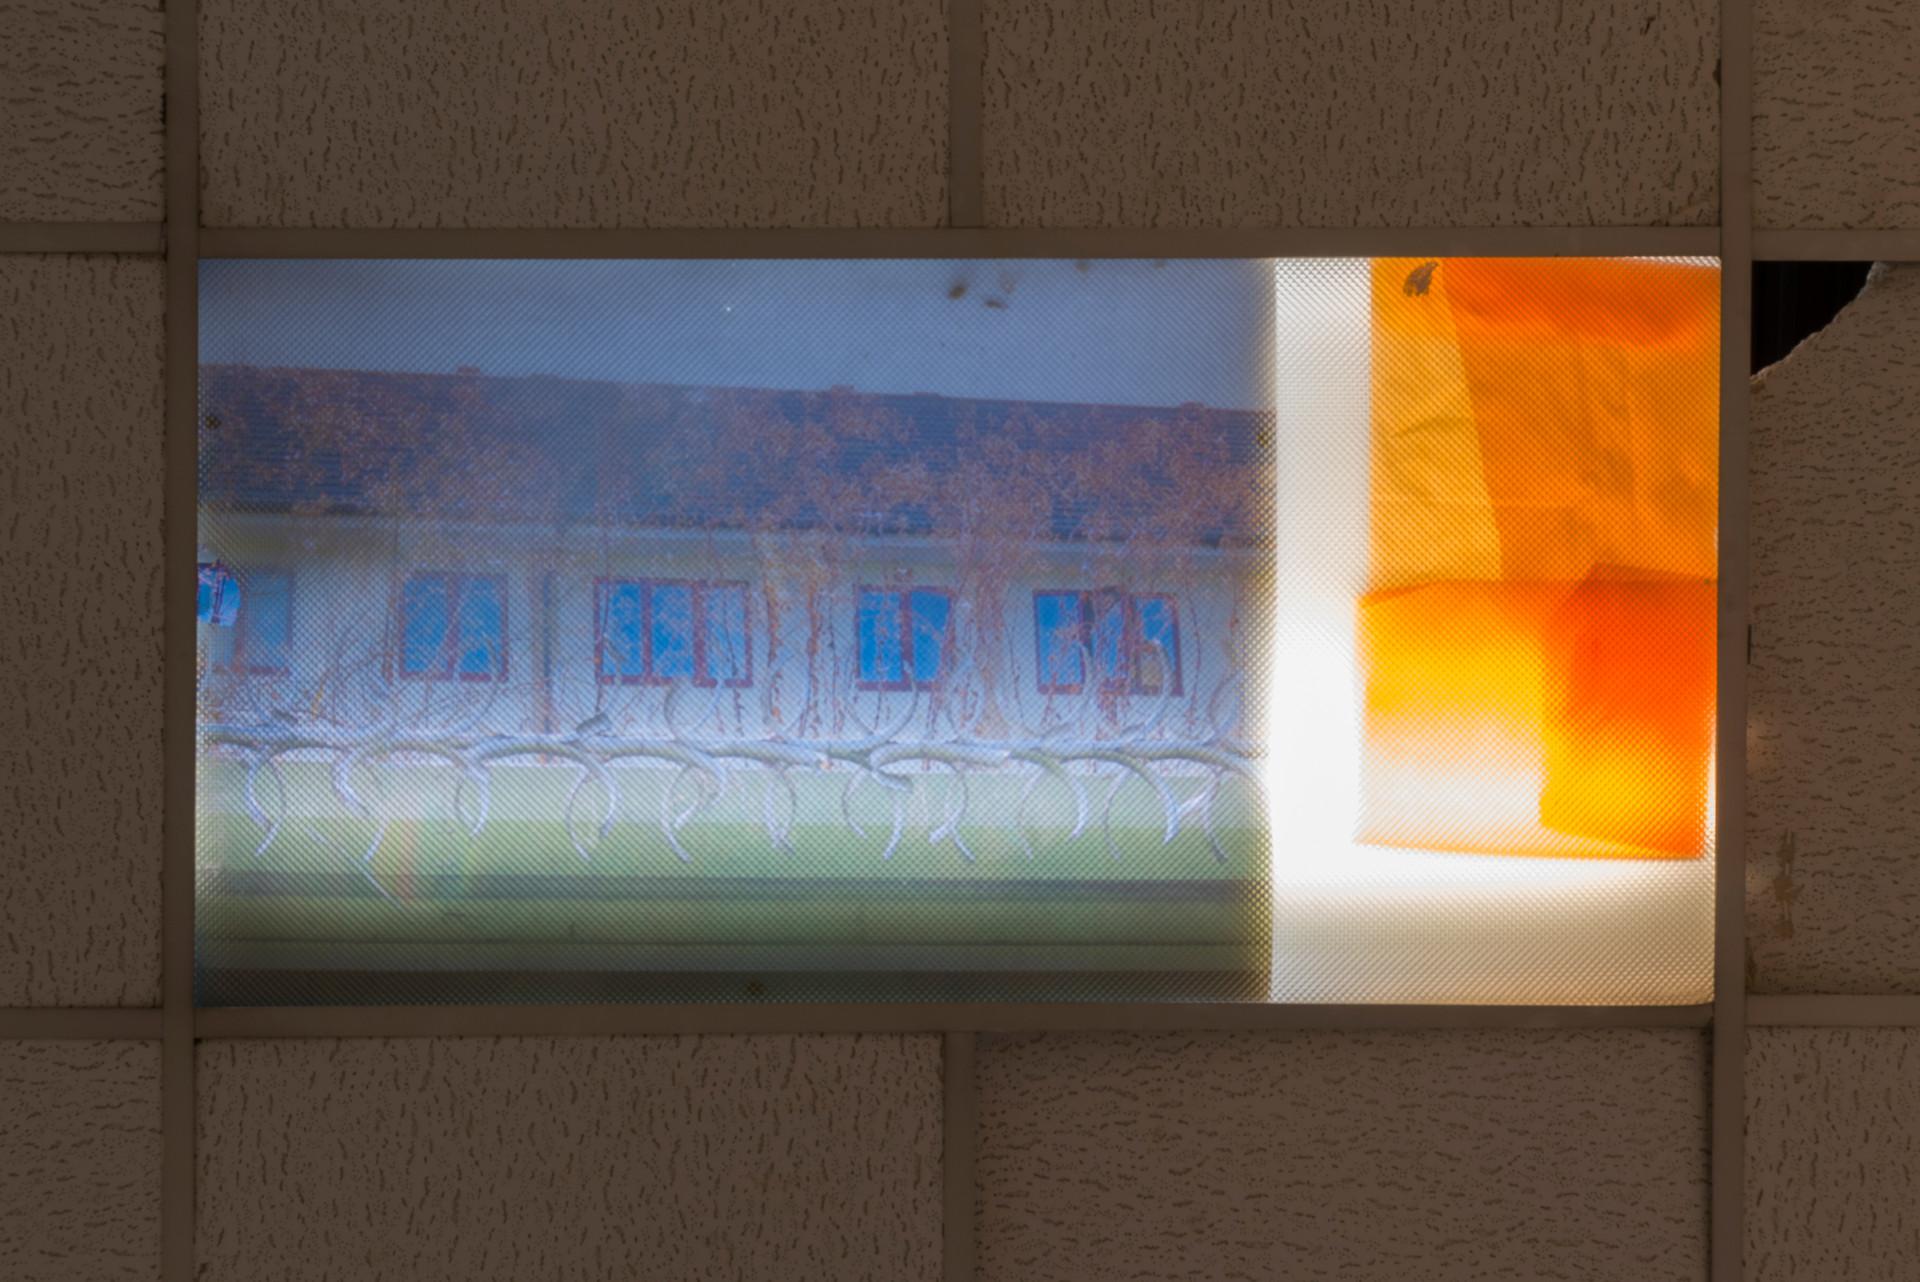 lightbox-crop2.jpg